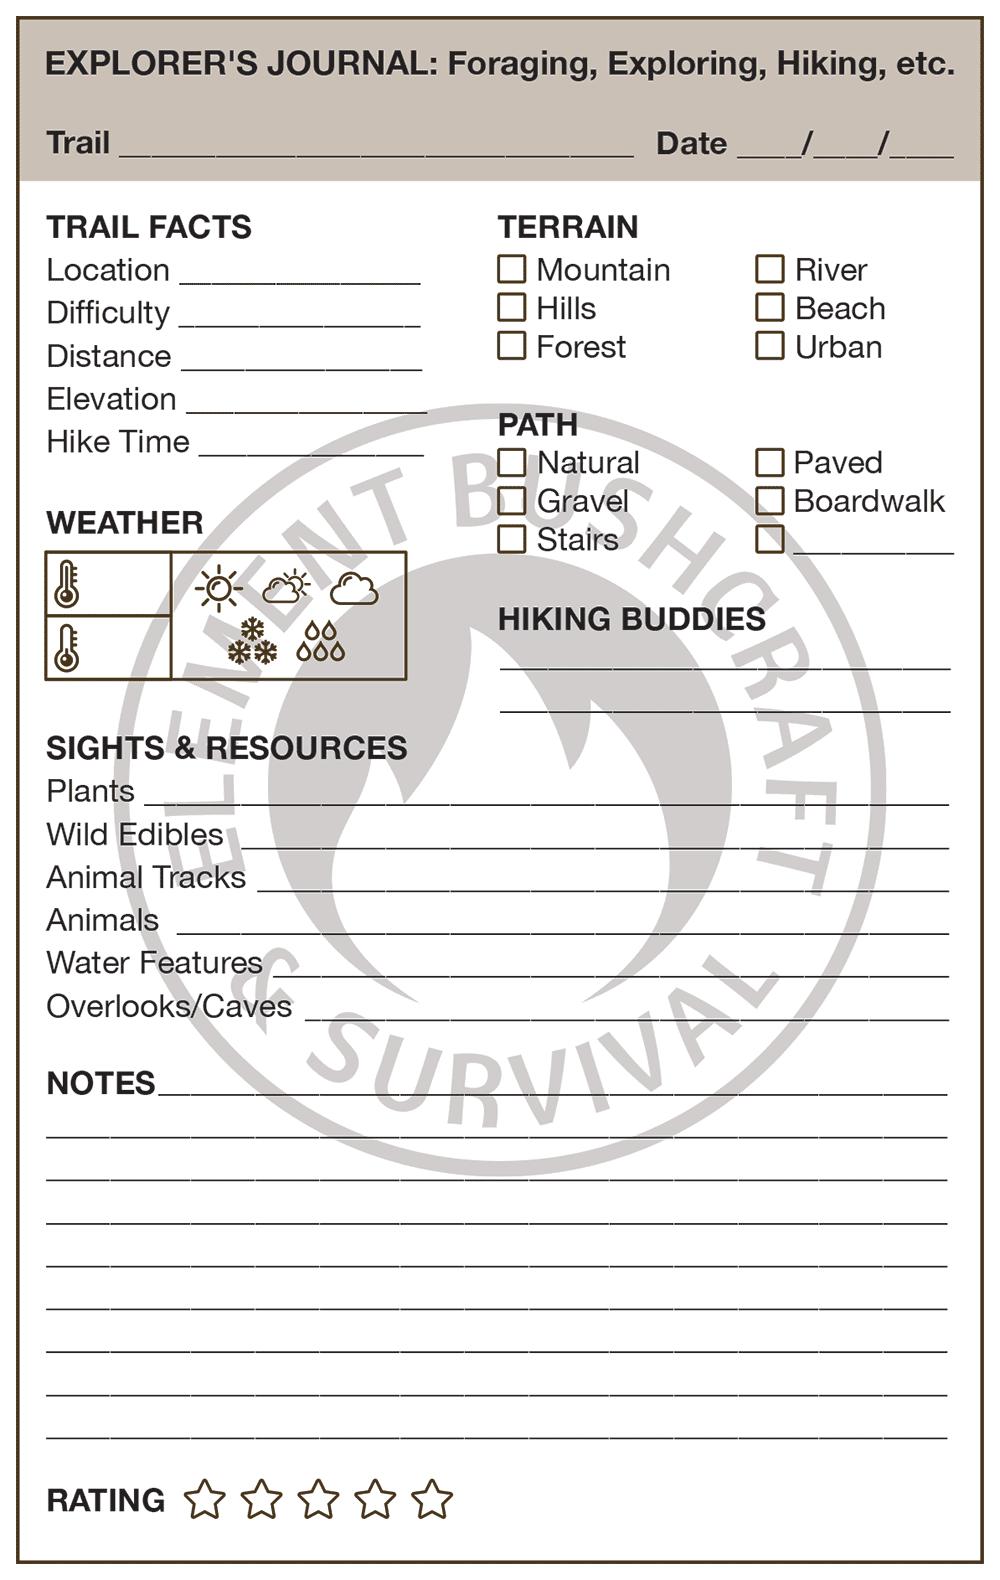 Hiking Journal Page Sample